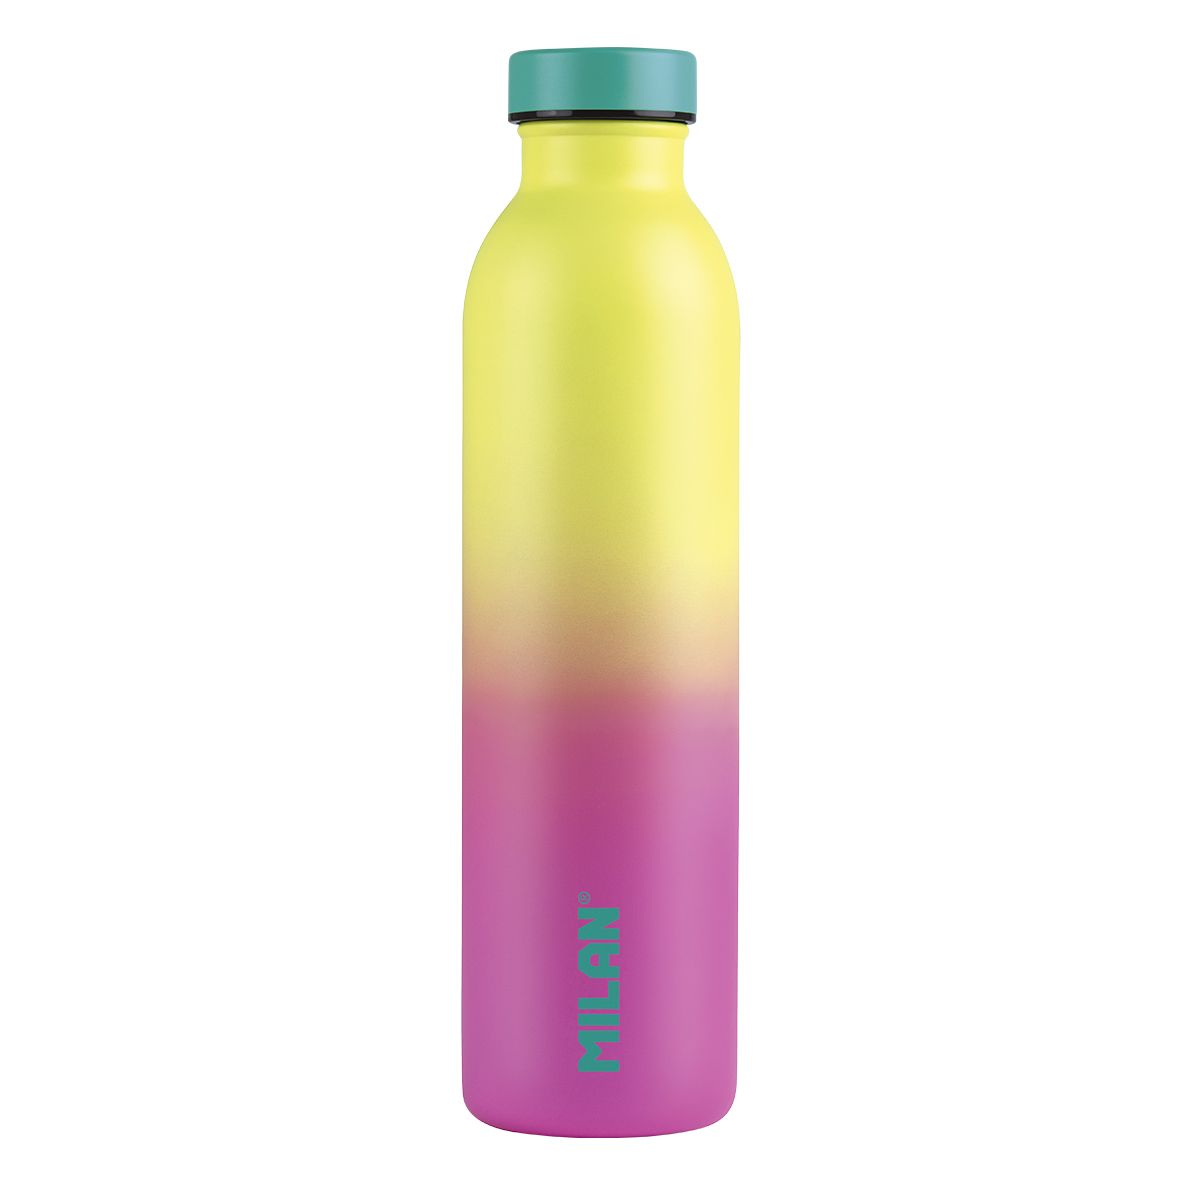 Termos - Sunset Edition - Yellow-Pink, 591 ml